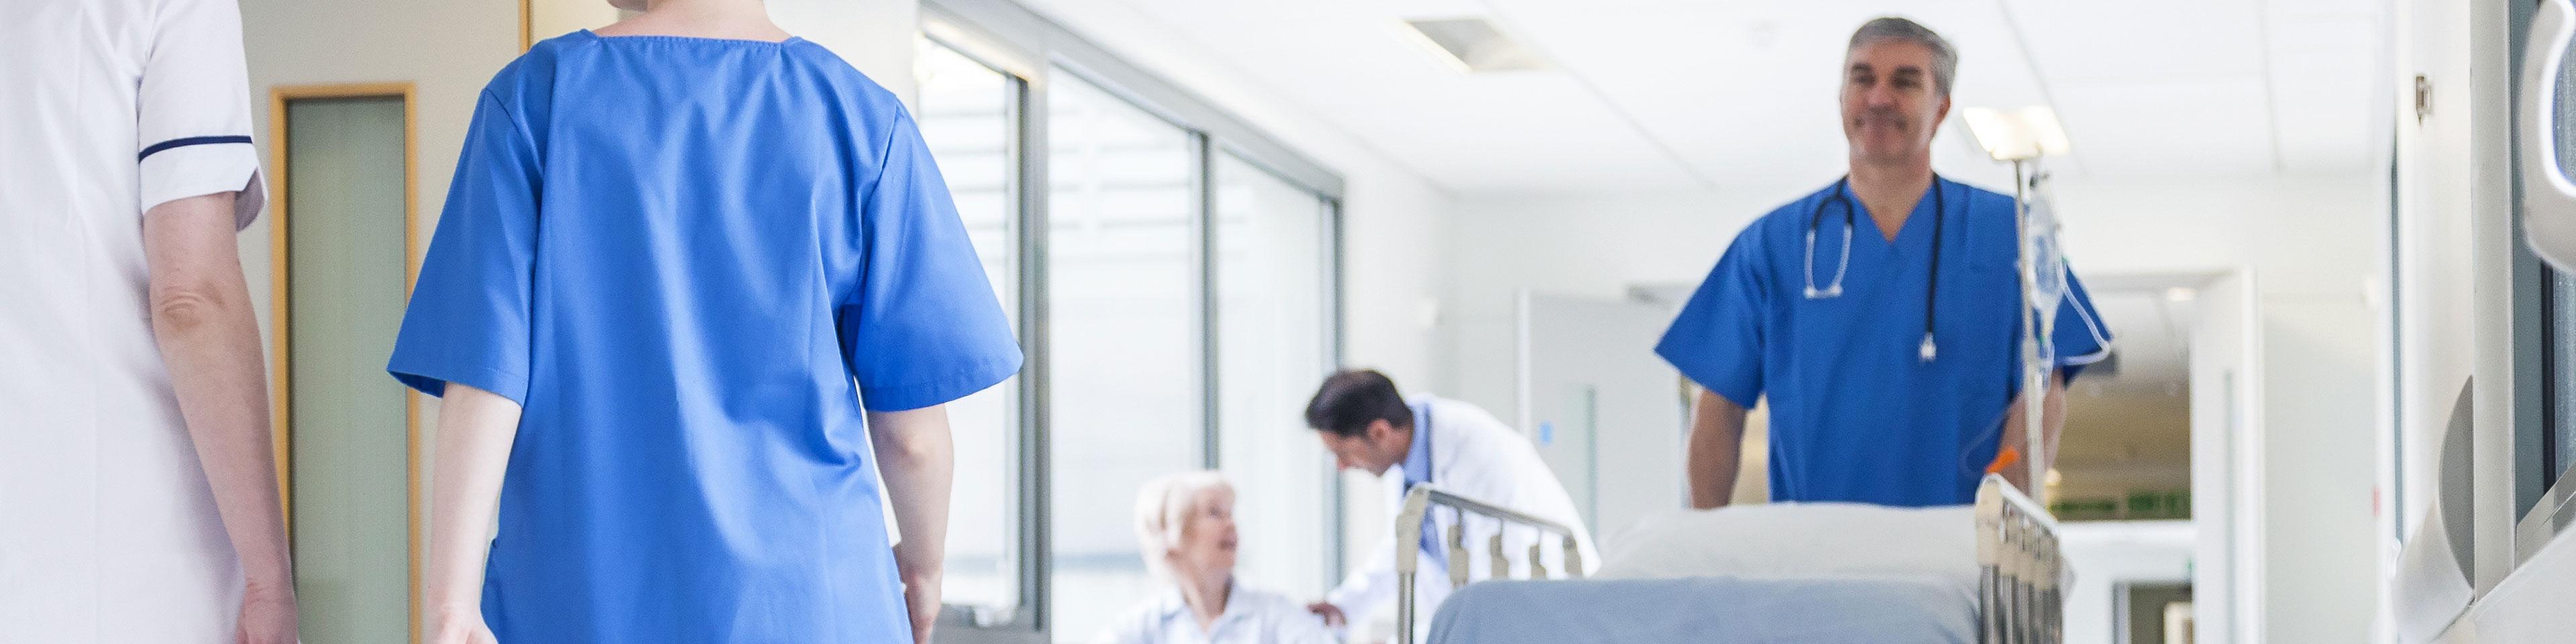 Improving Patient Handoff Safety